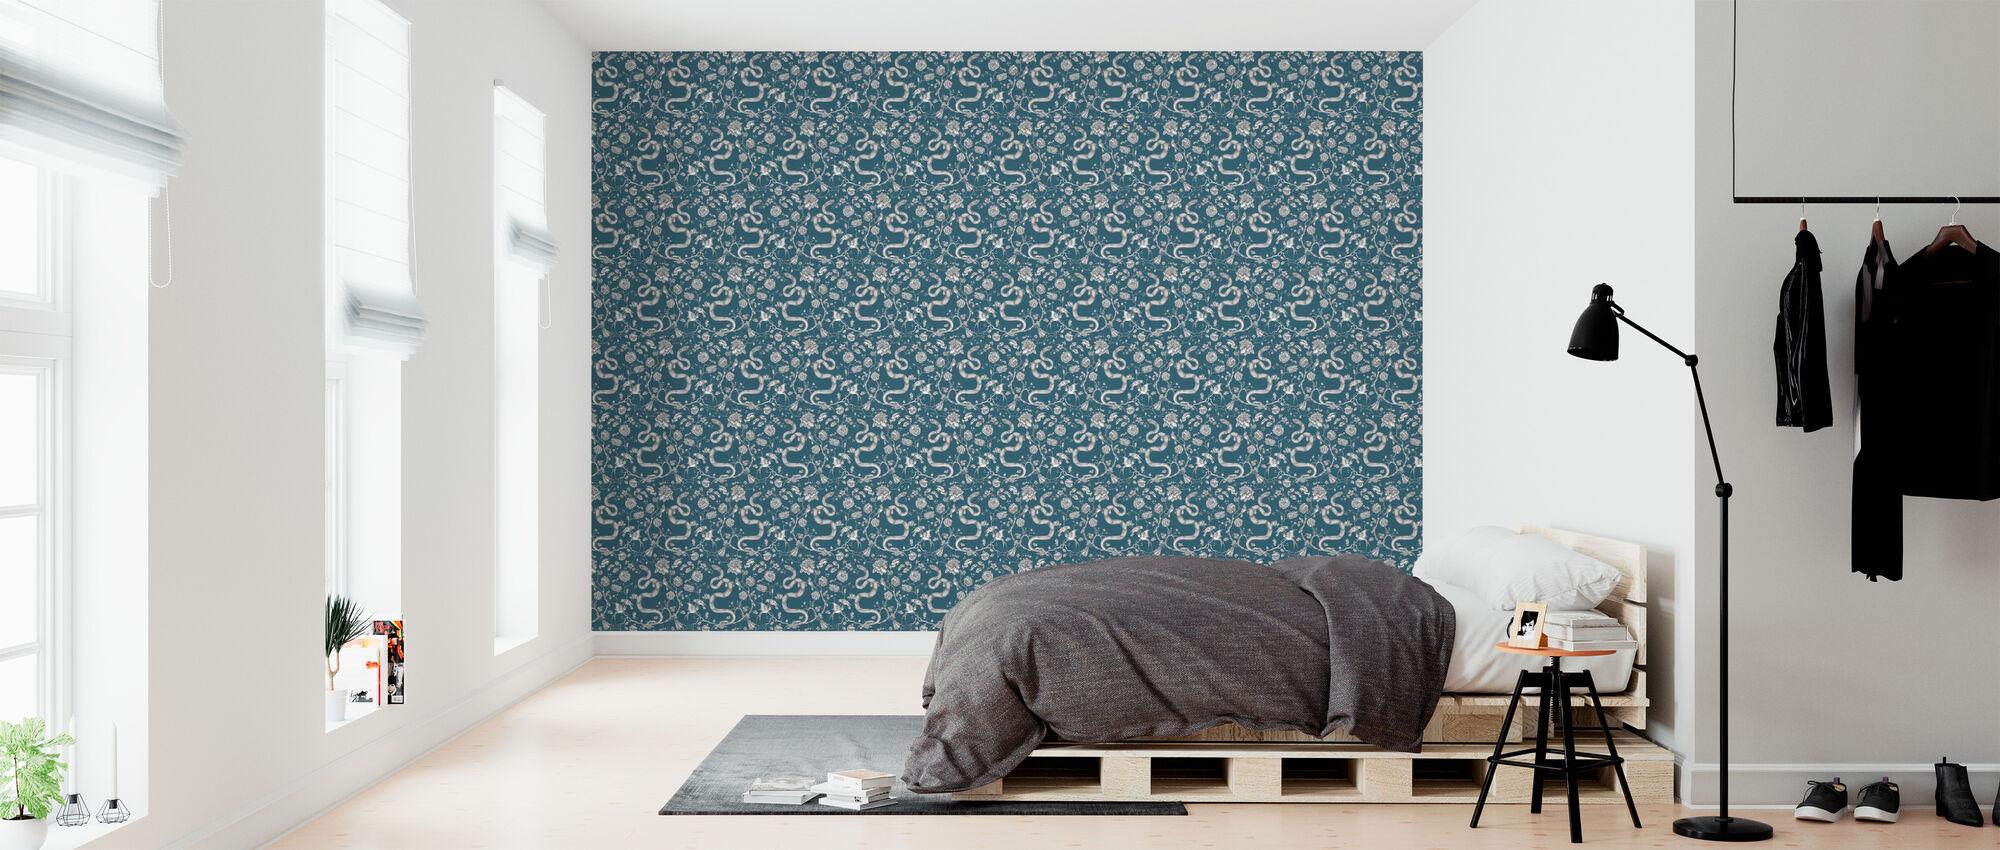 Snake Petrol - Wallpaper - Bedroom